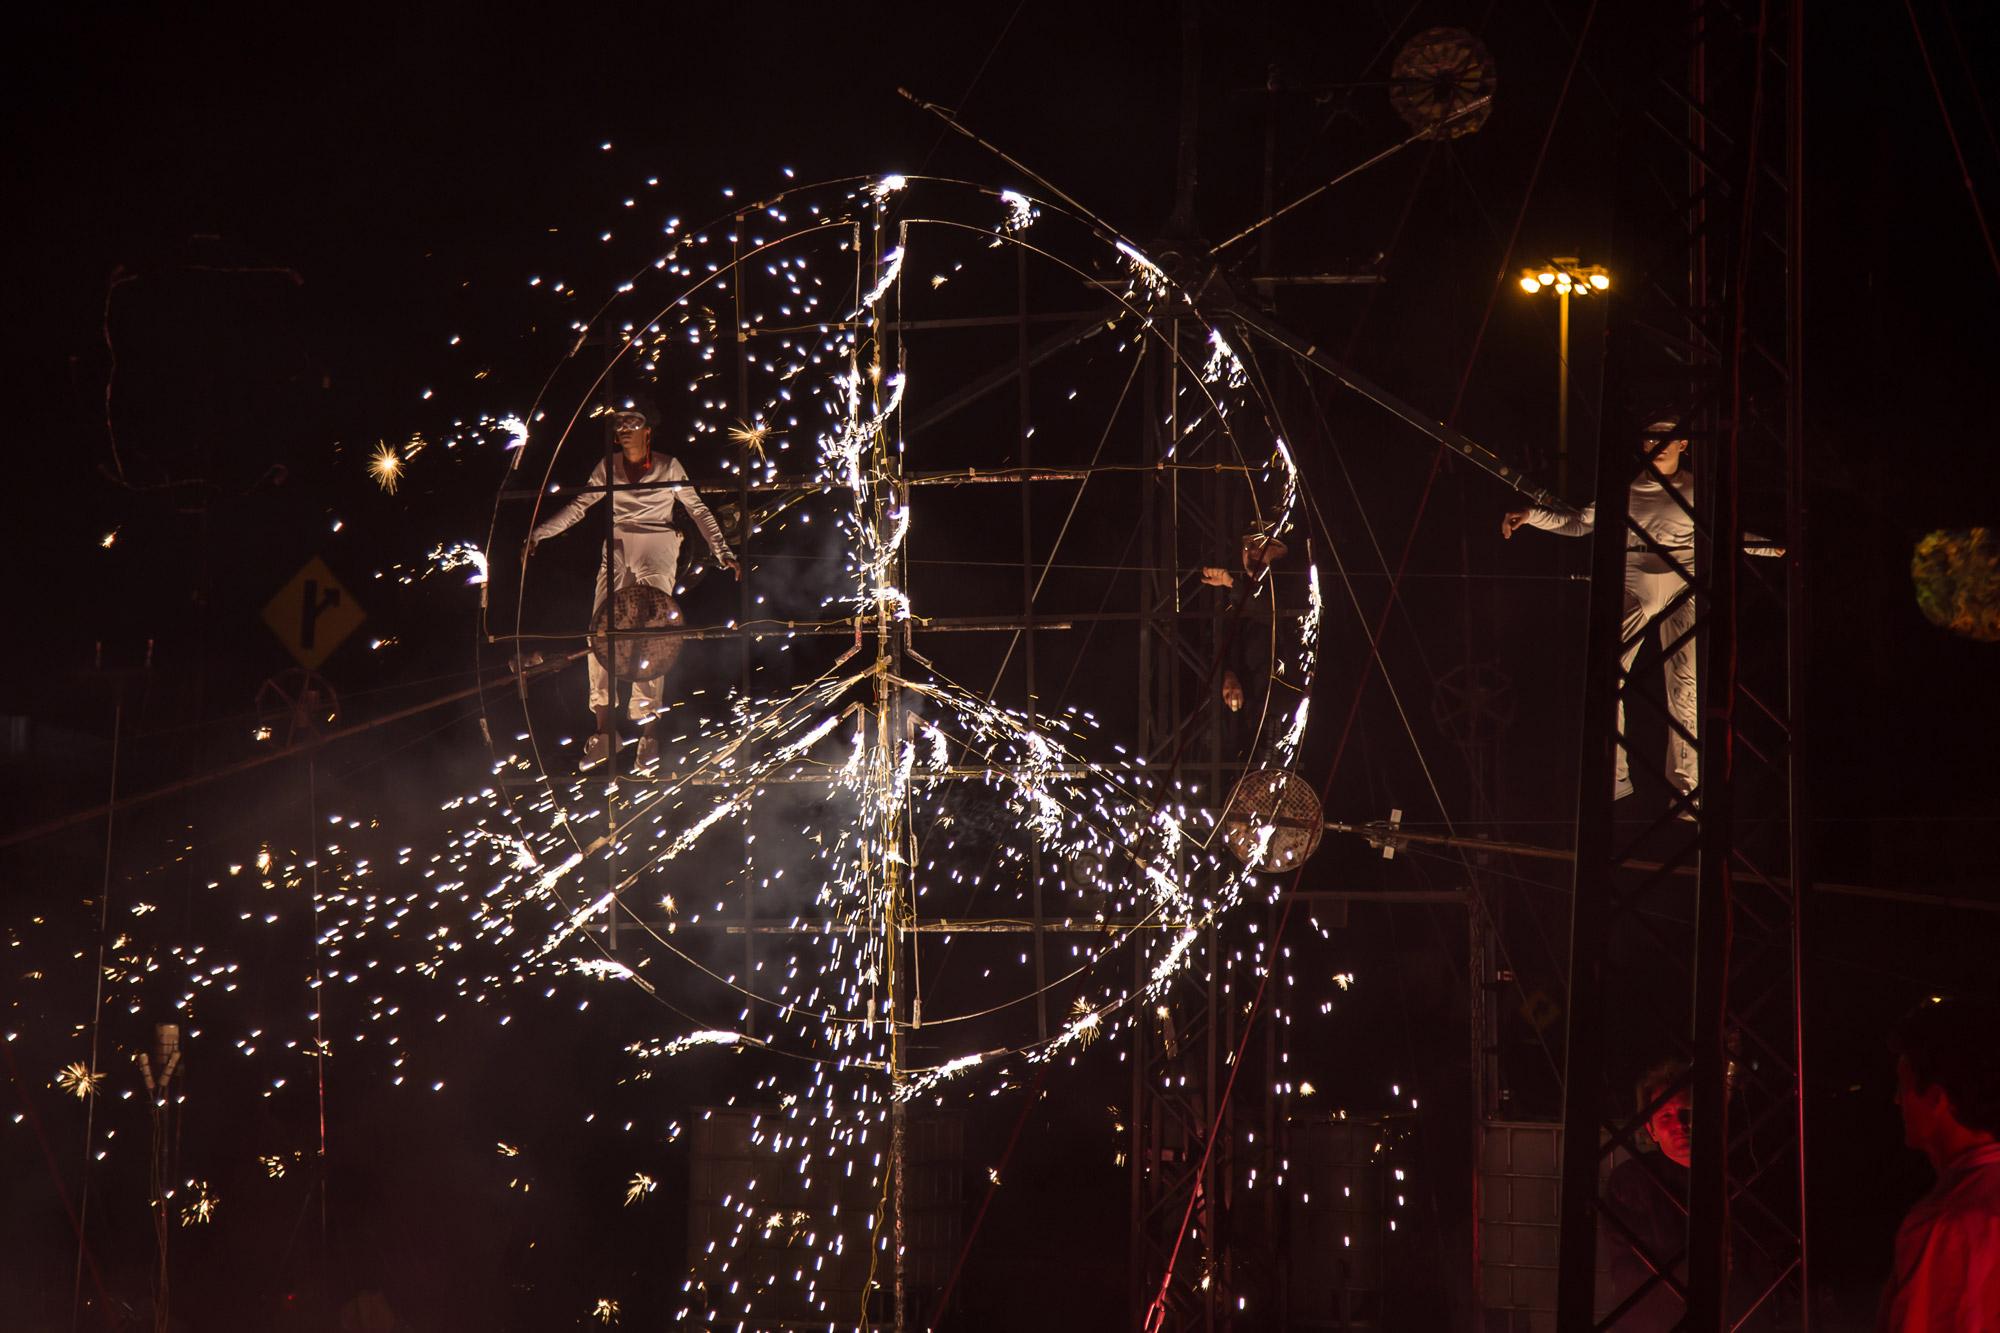 Festival del Desierto, Matehuala, Mexico, PAN.OPTIKUM, human factorMatthias Rettner, Sigrun Fritsch